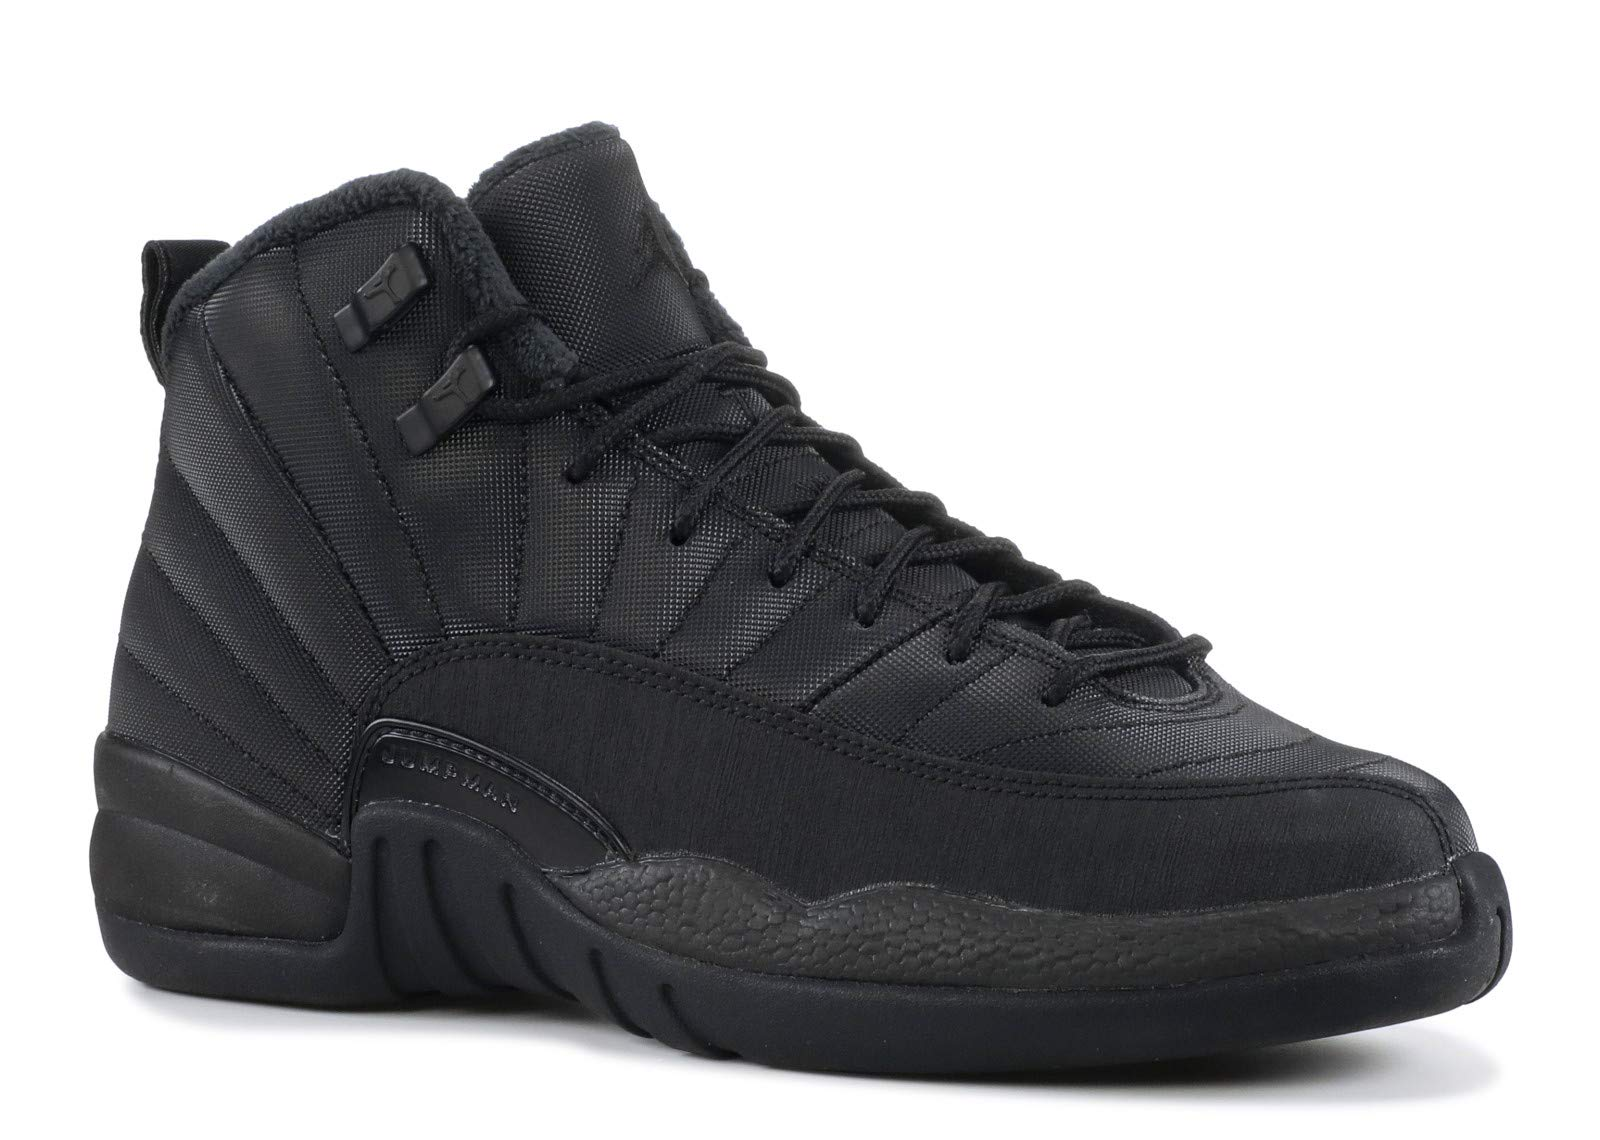 Nike Air Jordan 12 Retro Winter GS Triple Black BQ6852-001 (Size: 4Y)